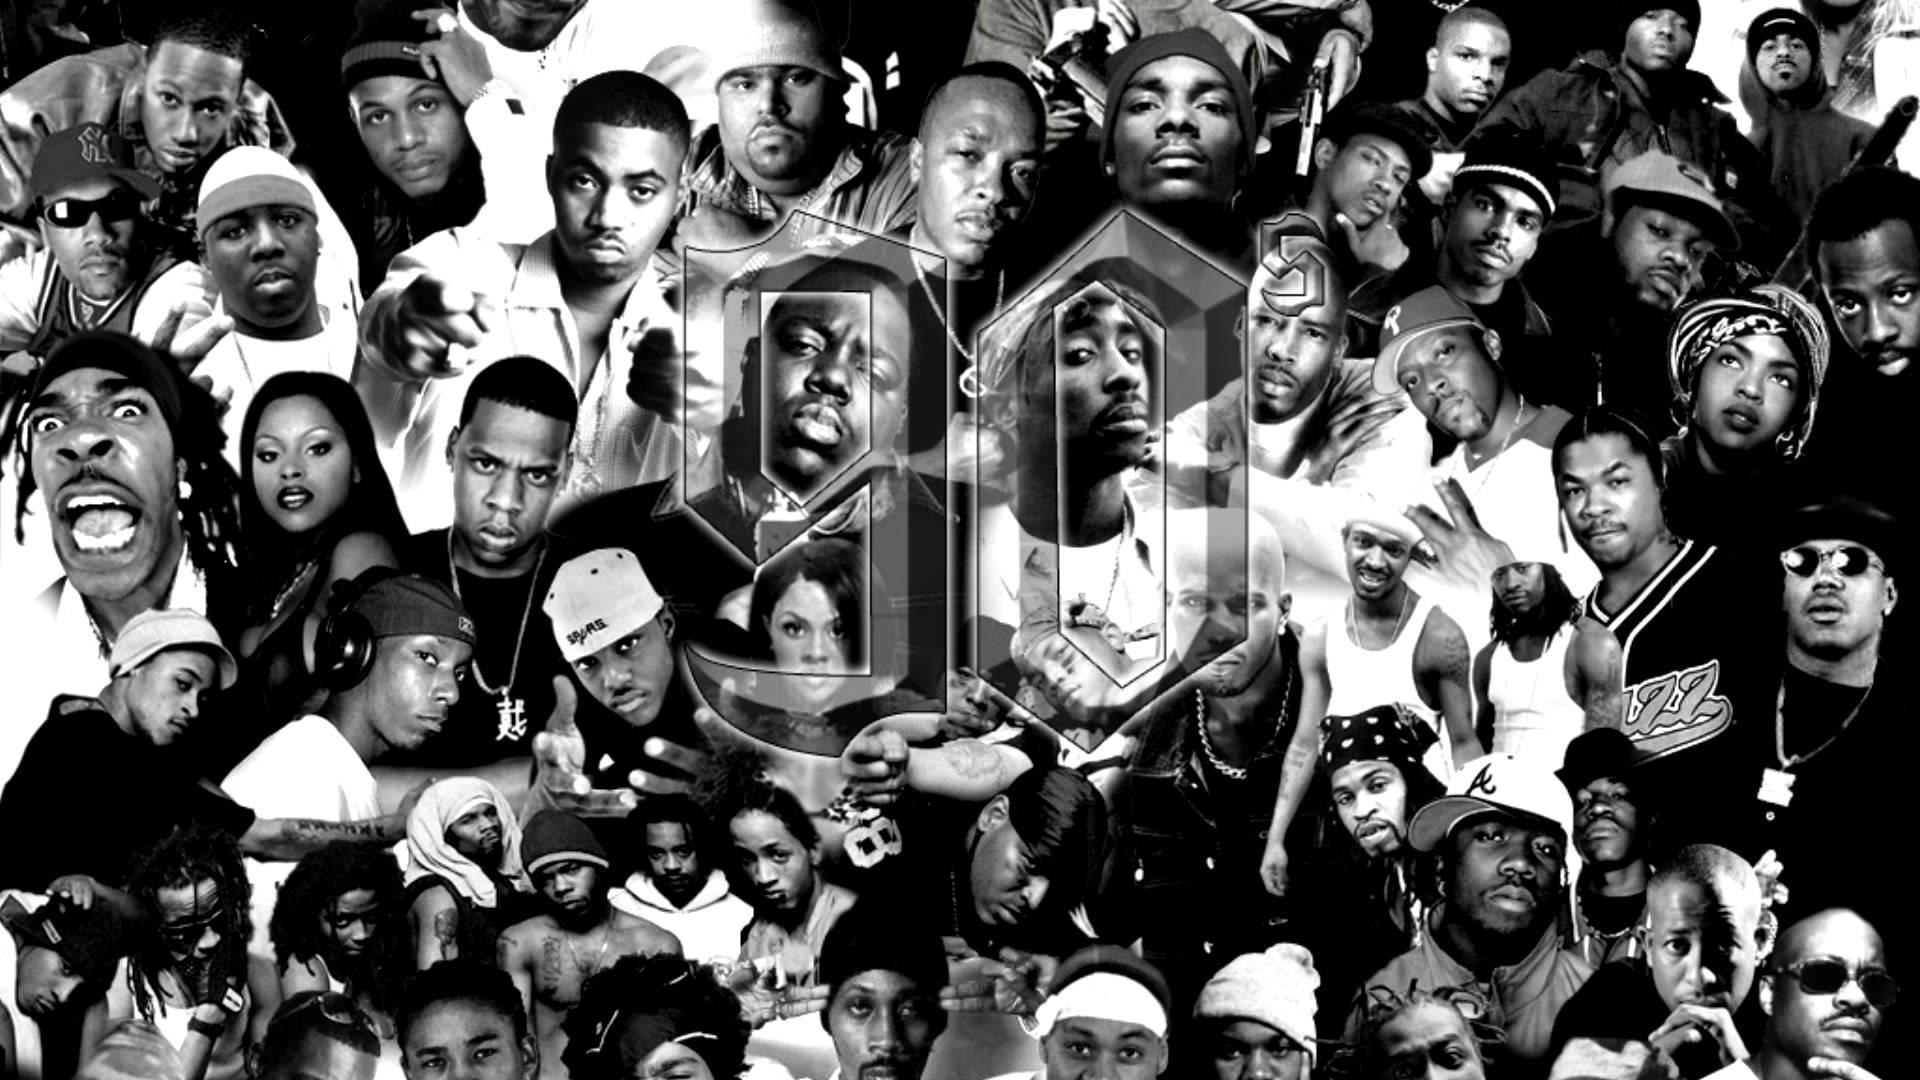 Old School Rap Wallpaper 77 Images